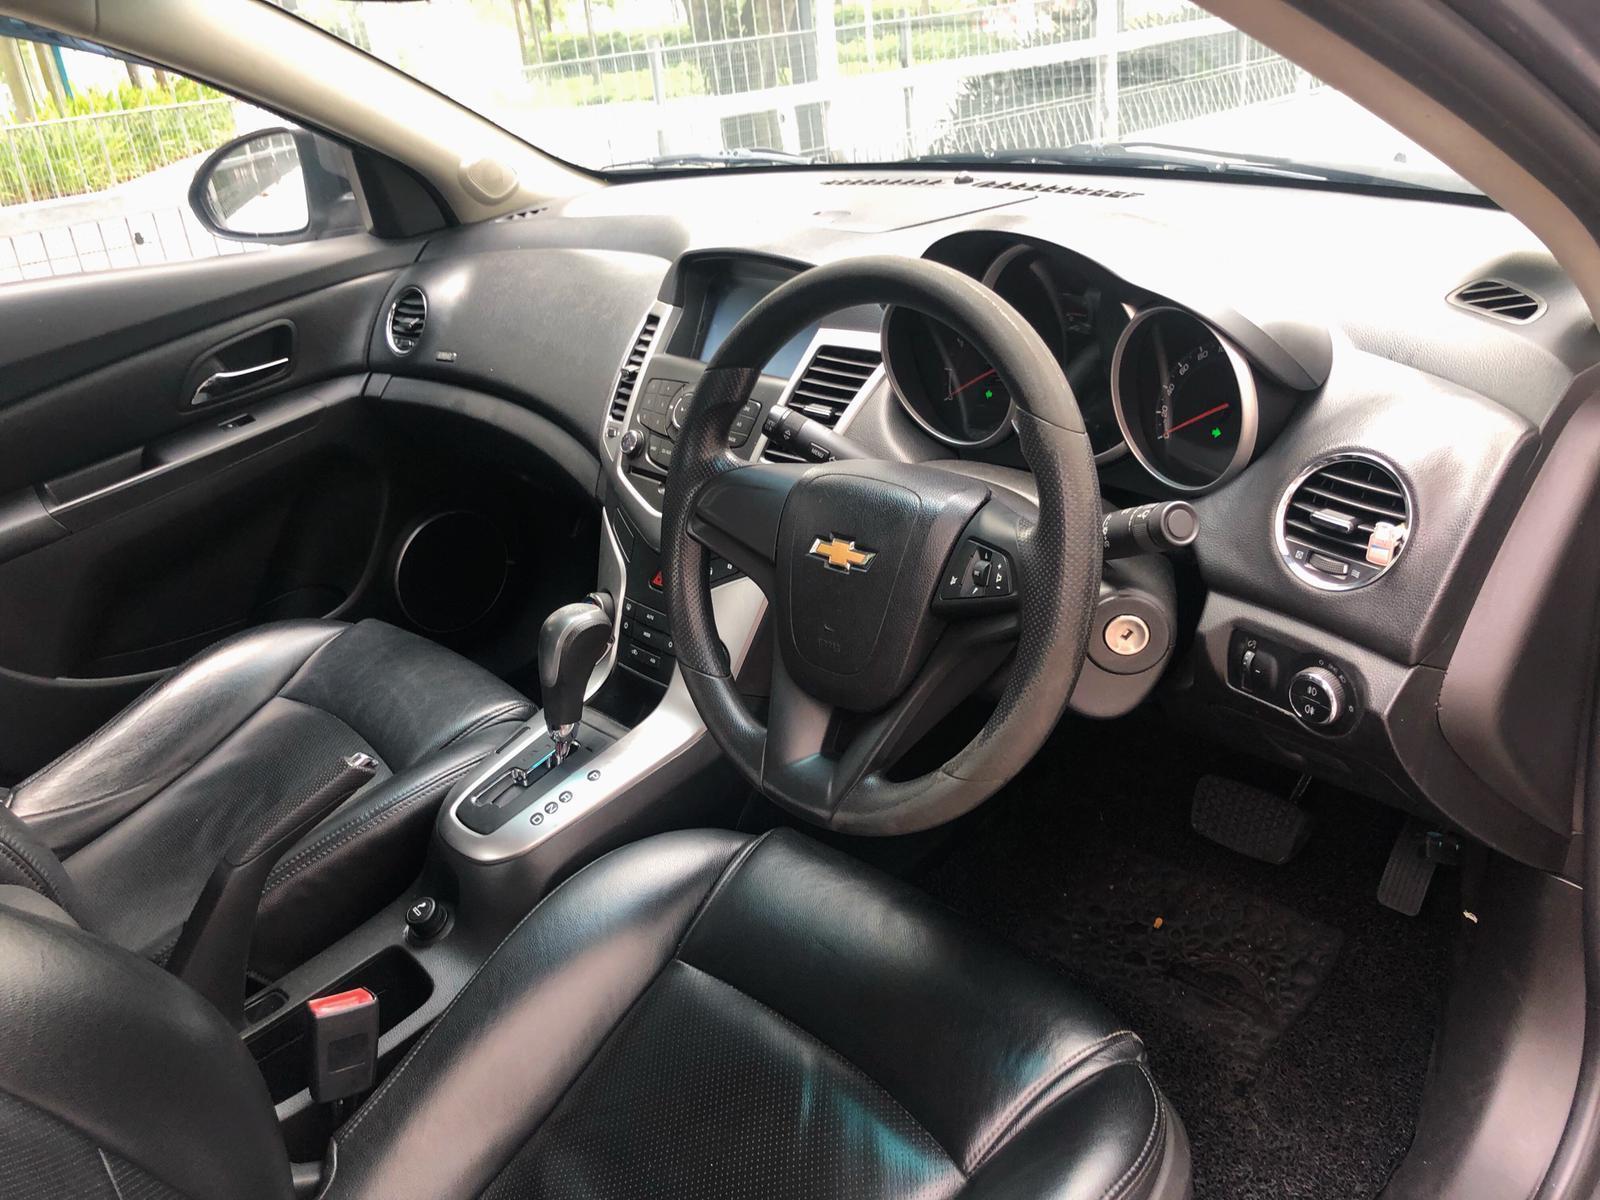 Chevrolet Cruze 1.6A BEST RENTAL for PHV Grab GoJek Ryde or Personal use